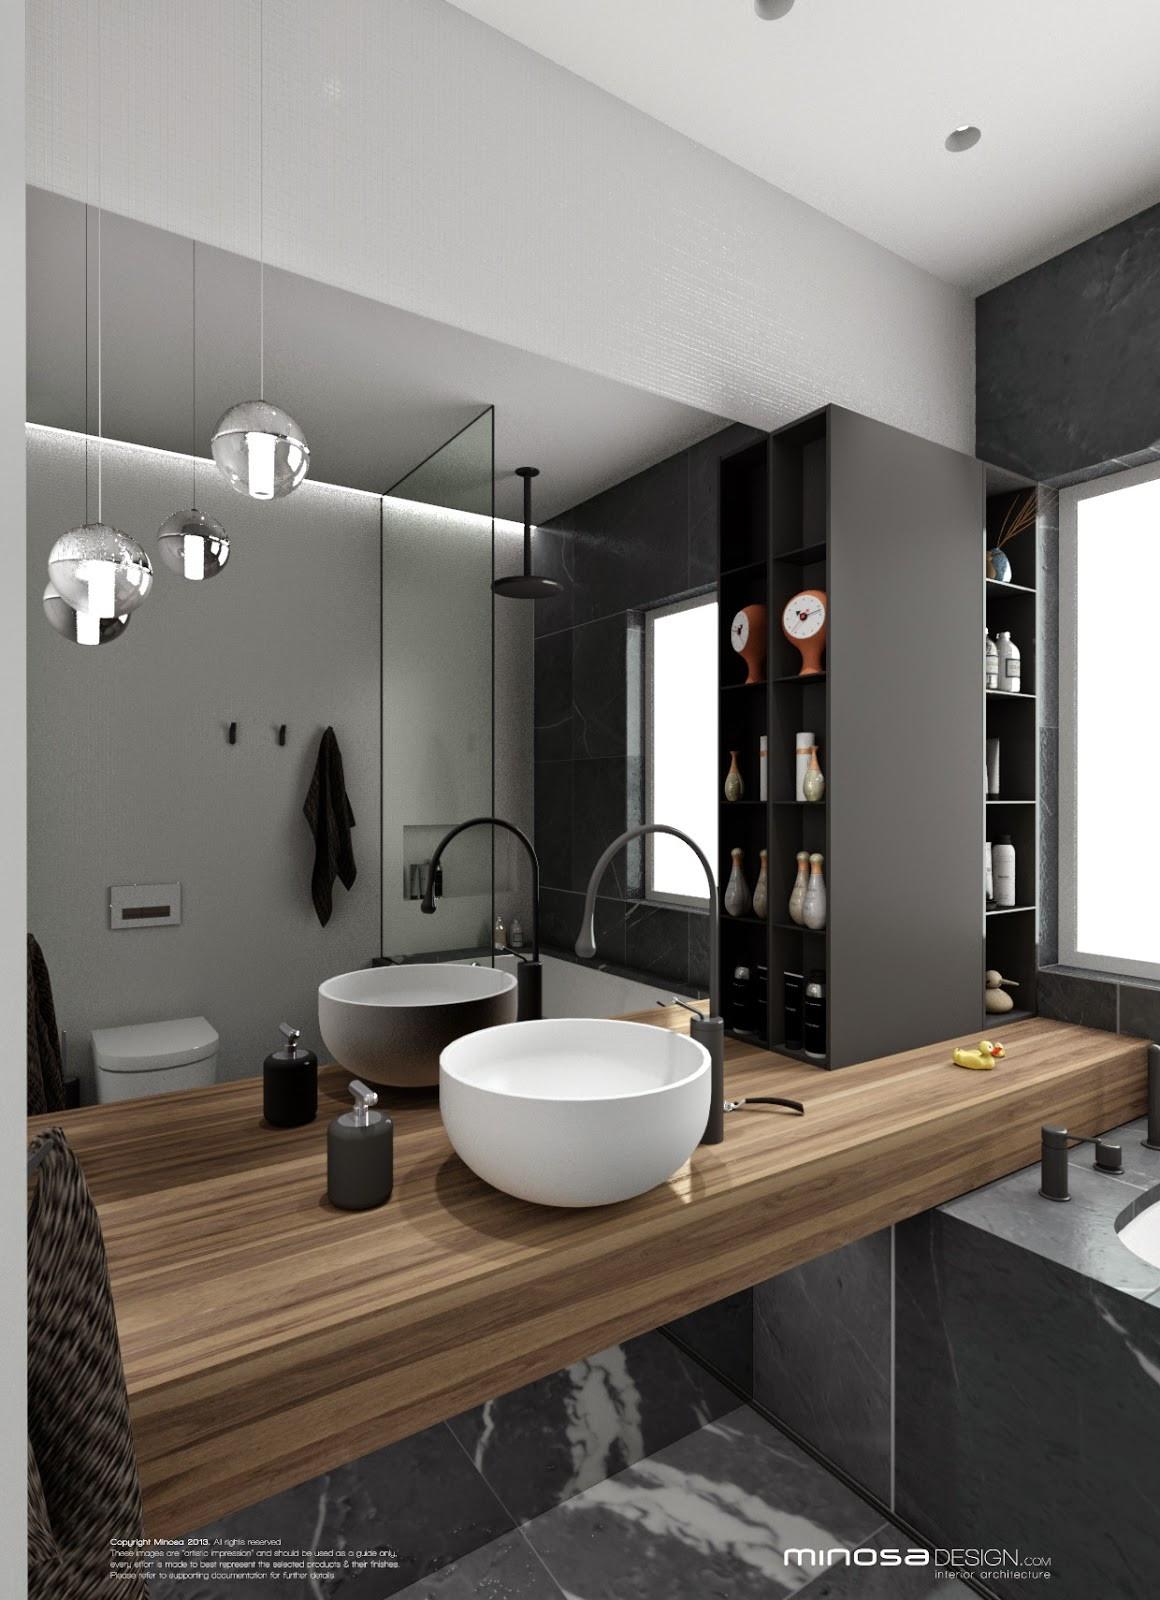 Design A Bathroom  Minosa Bathroom Design Small space feels large